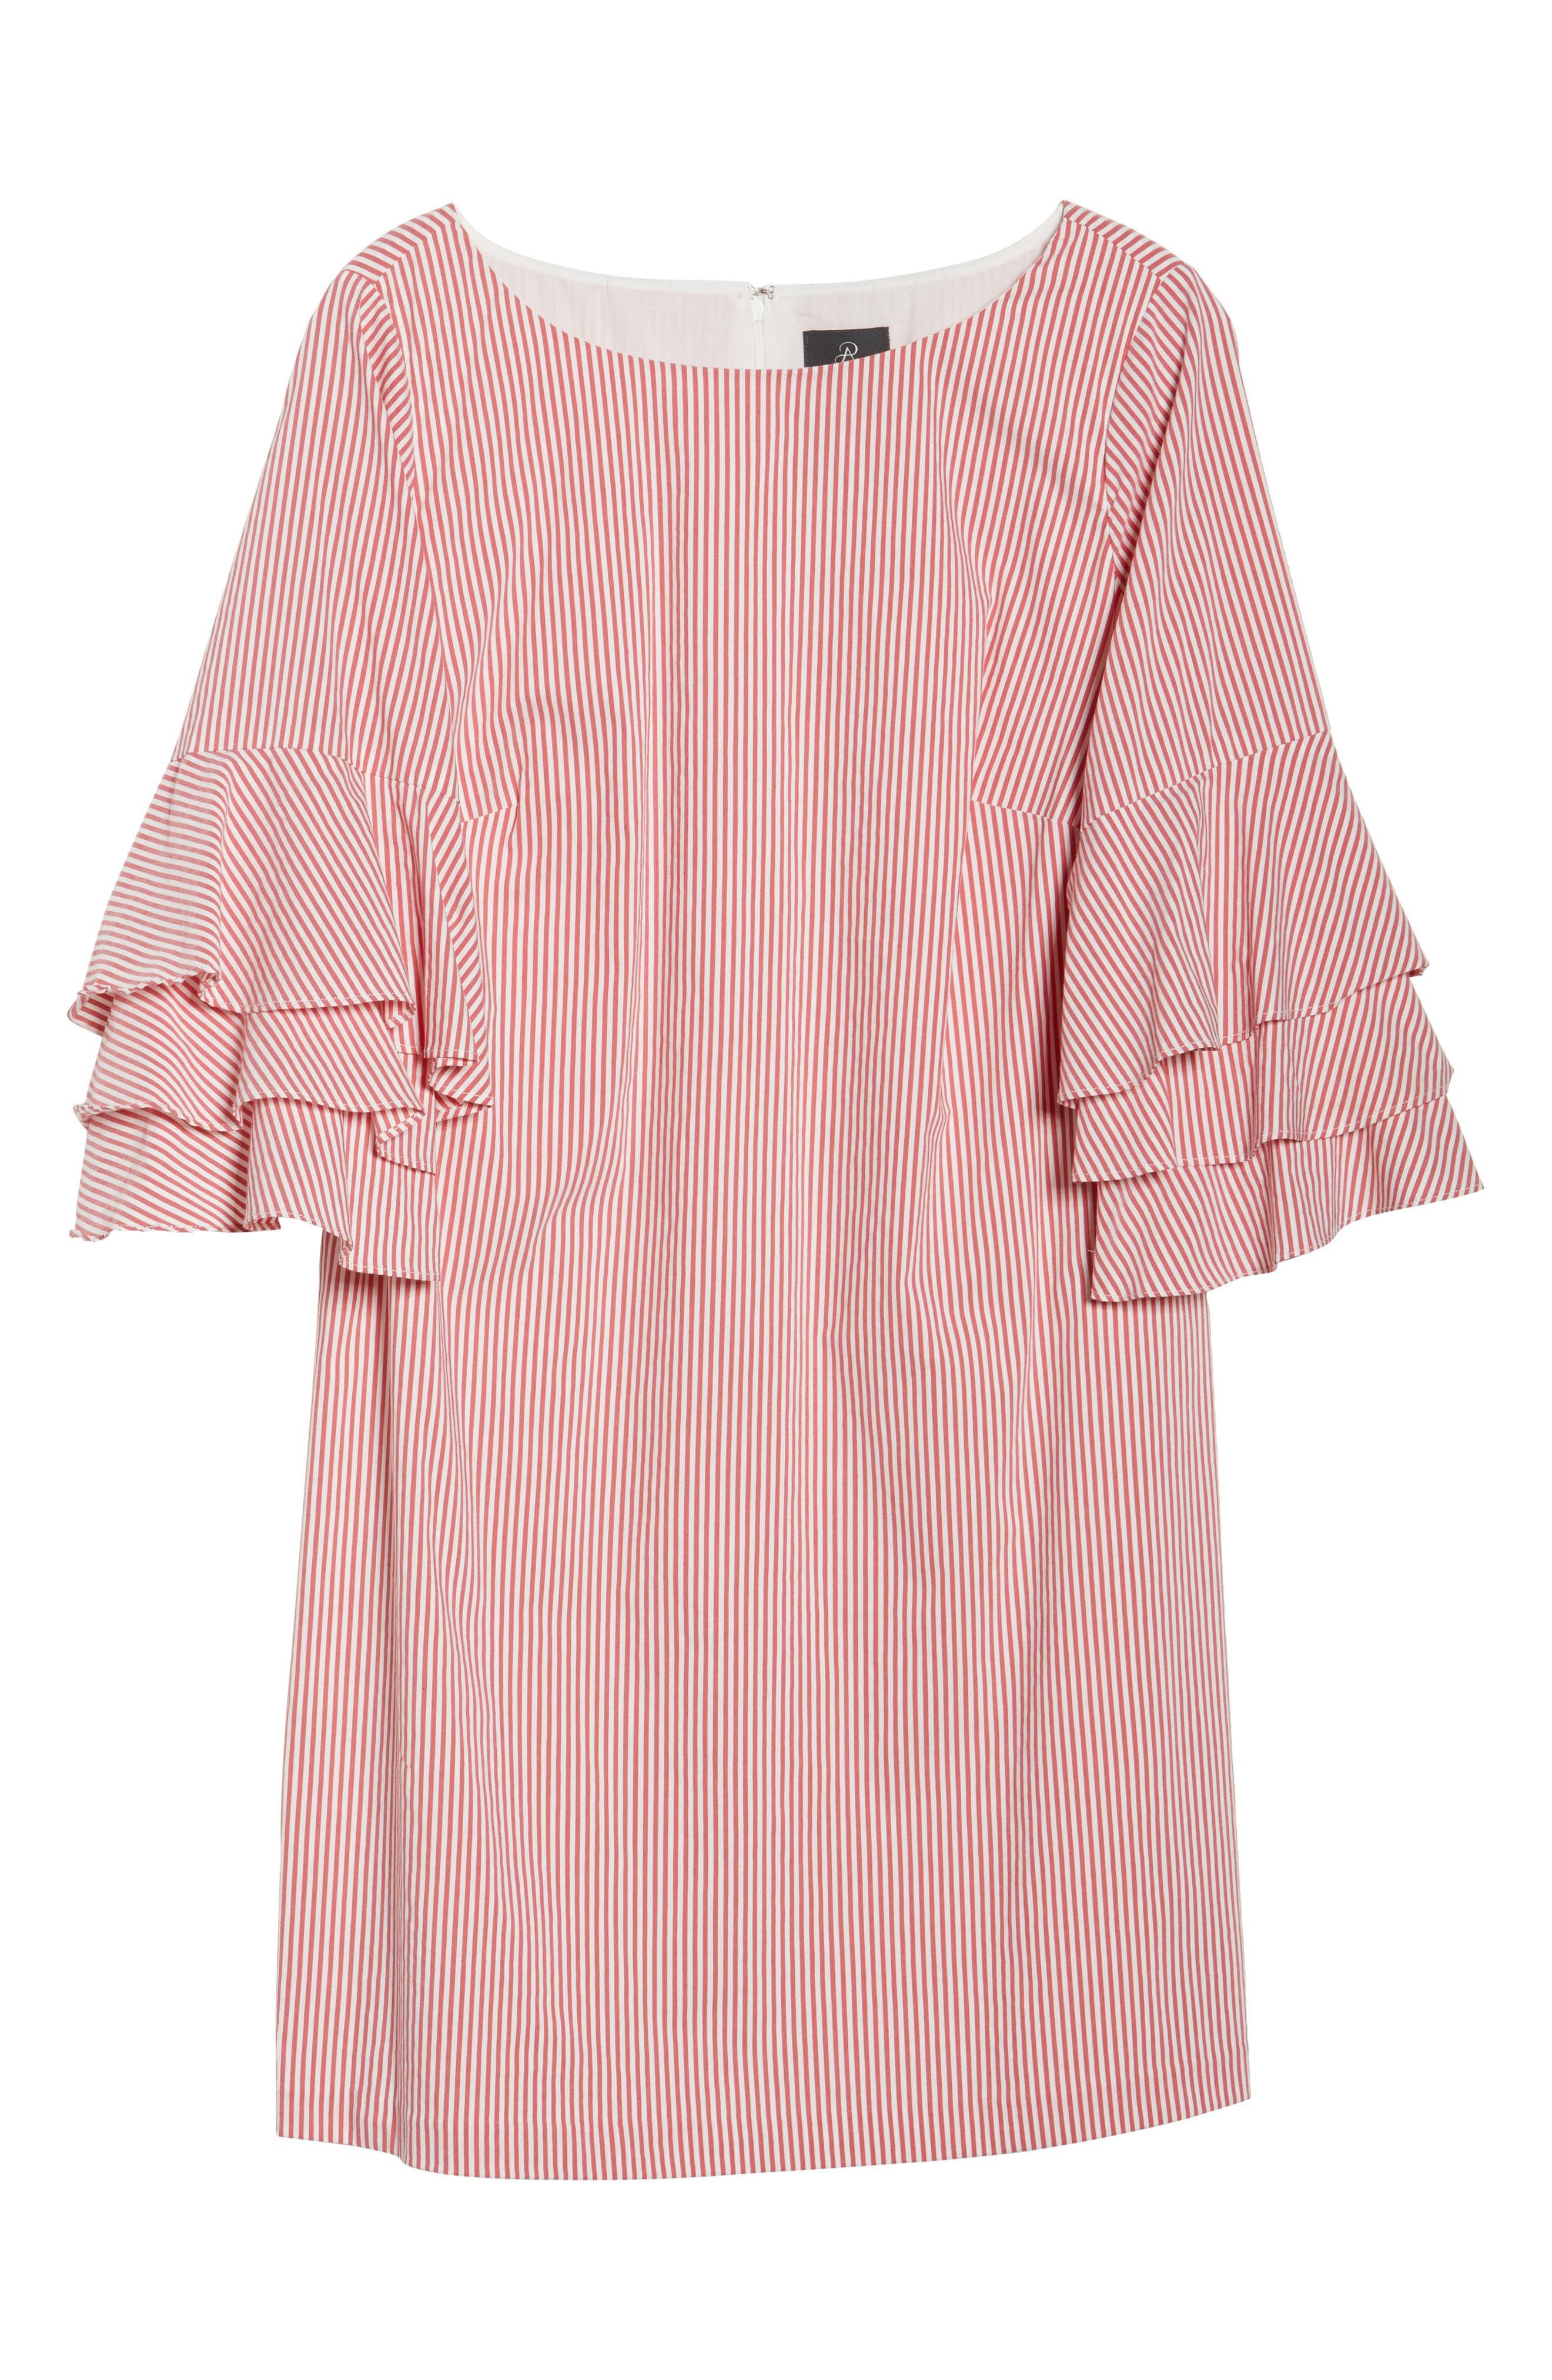 Ruffle Sleeve Stripe Shift Dress,                             Alternate thumbnail 6, color,                             644